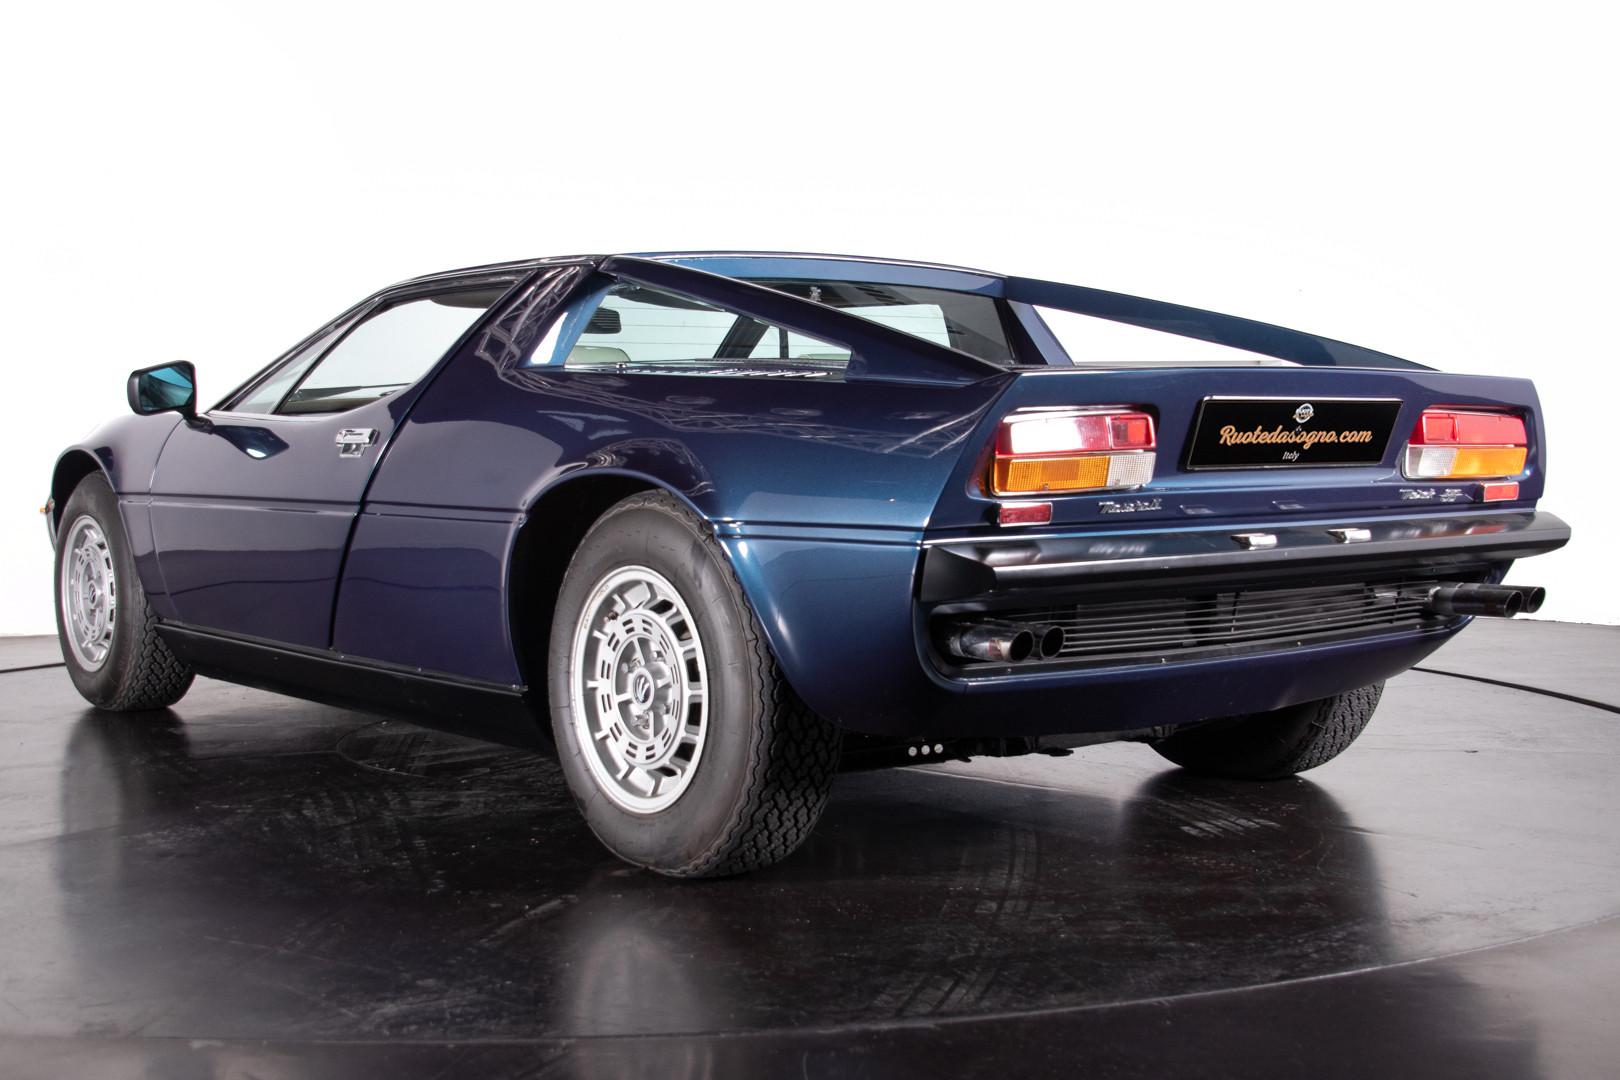 1981 MASERATI MERAK 3000 SS - Maserati - Classic cars ...